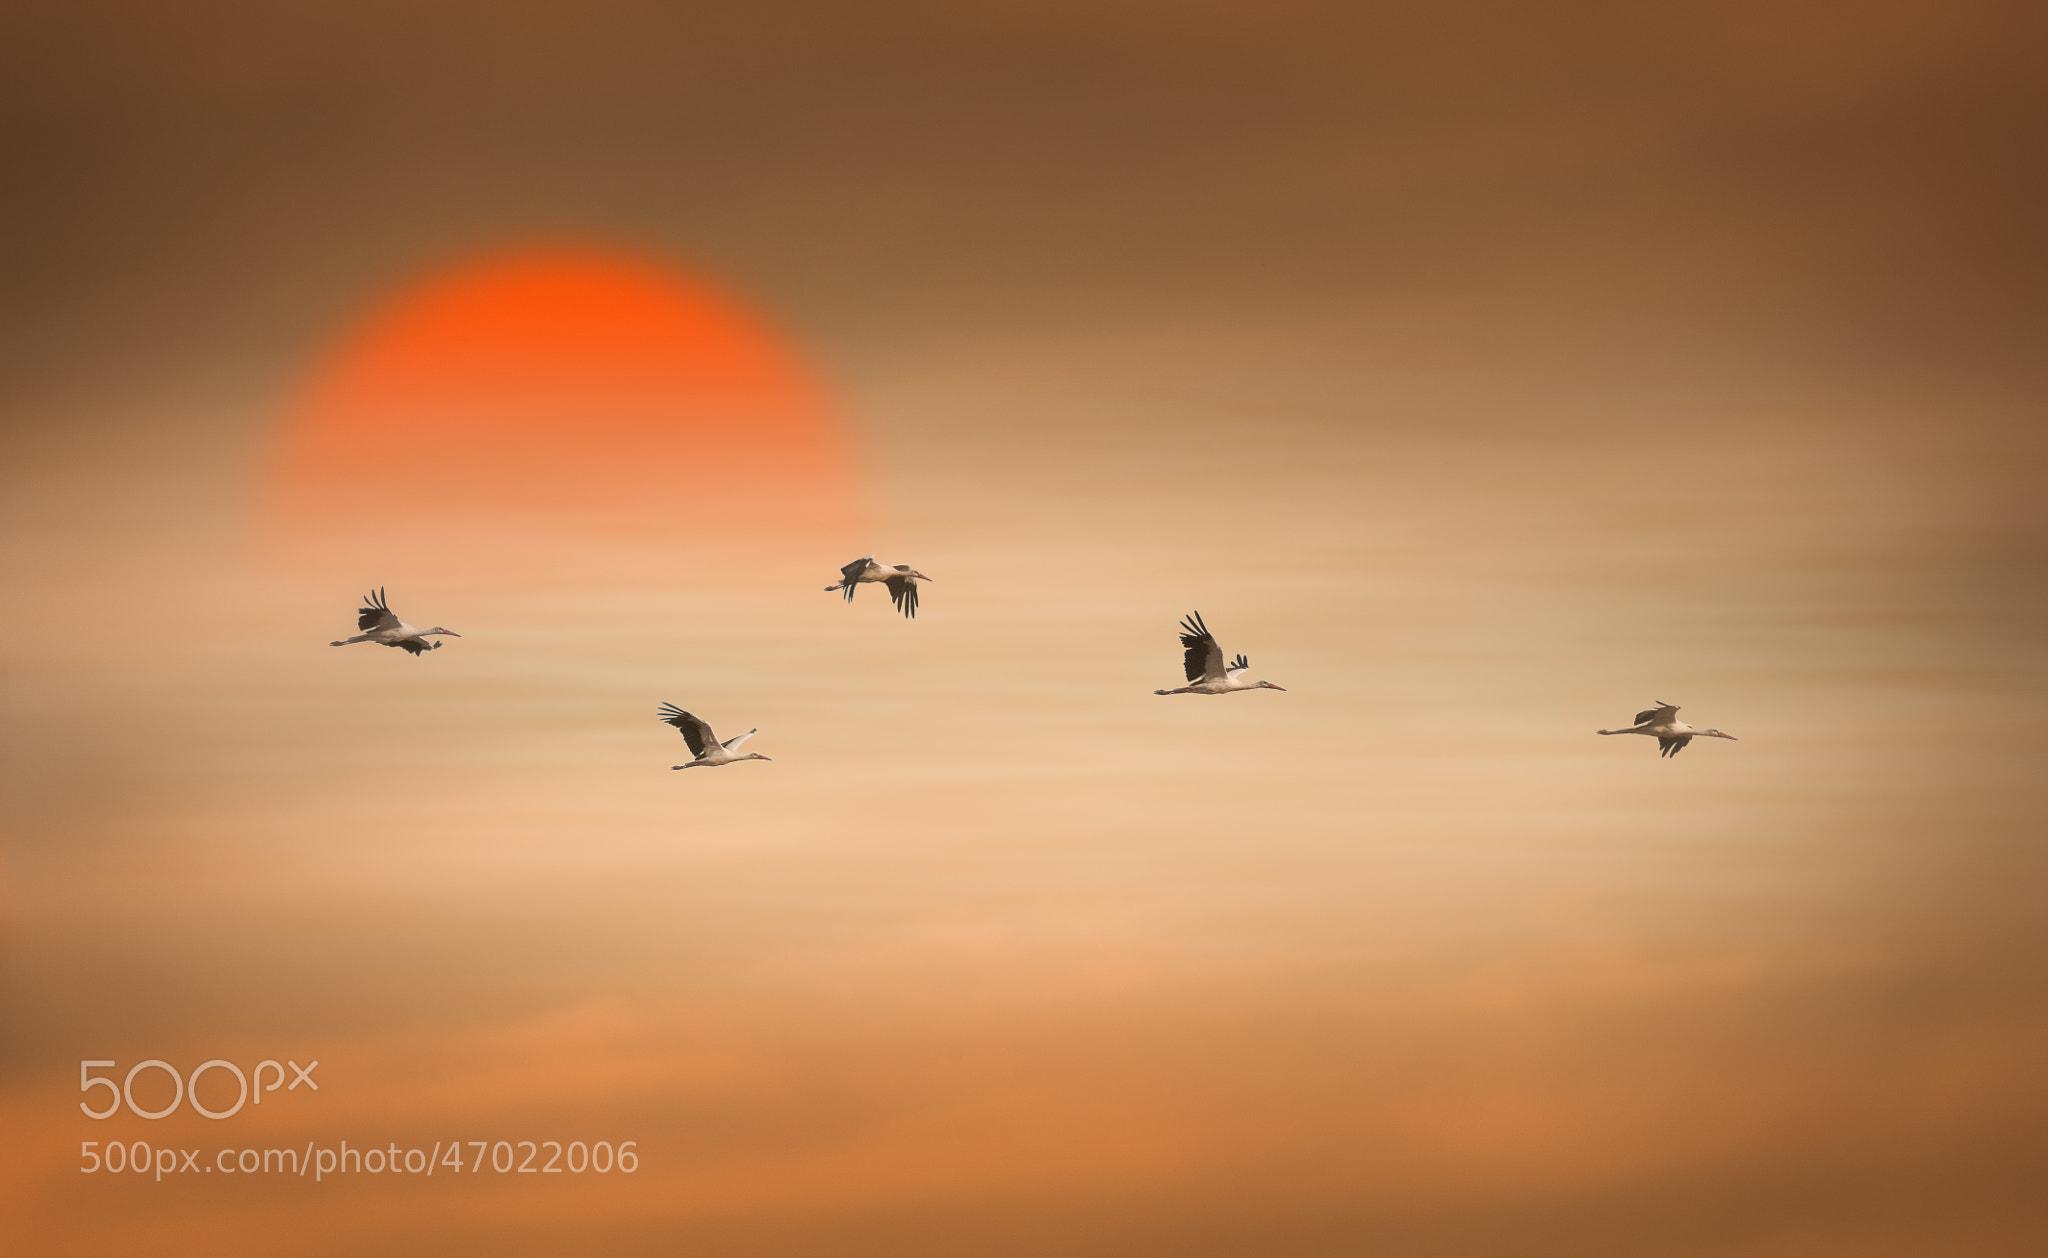 Photograph Storks at Sunset by Hani Latif Zaloum on 500px